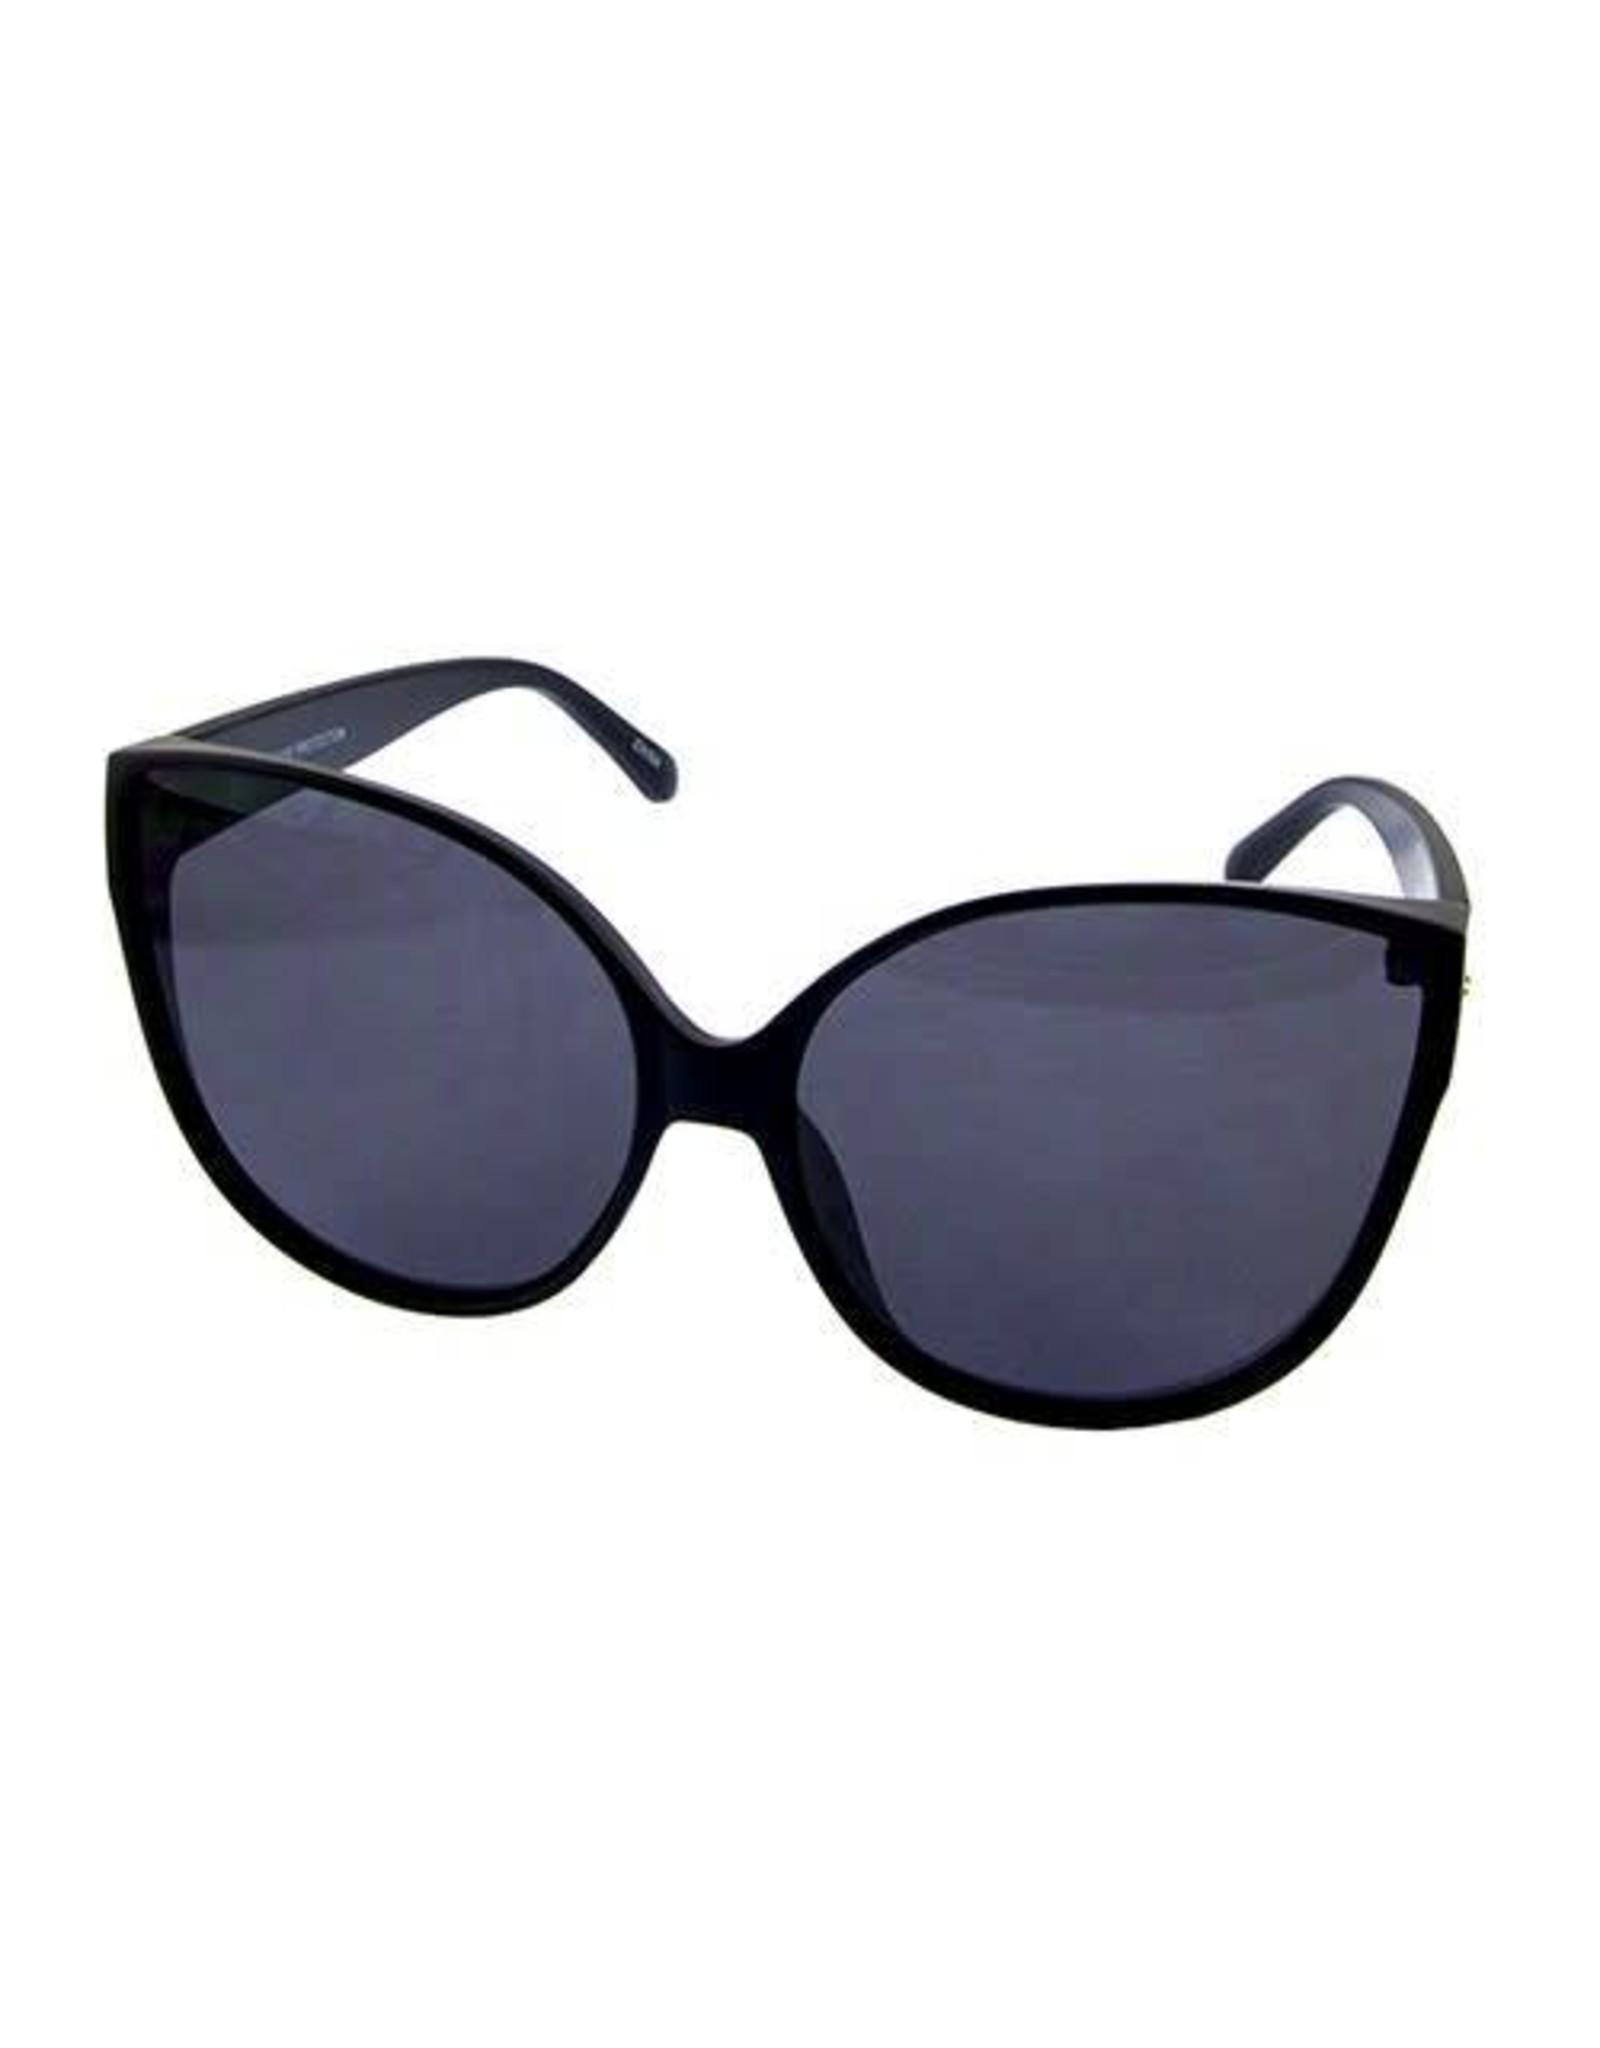 Capture Me Sunglasses